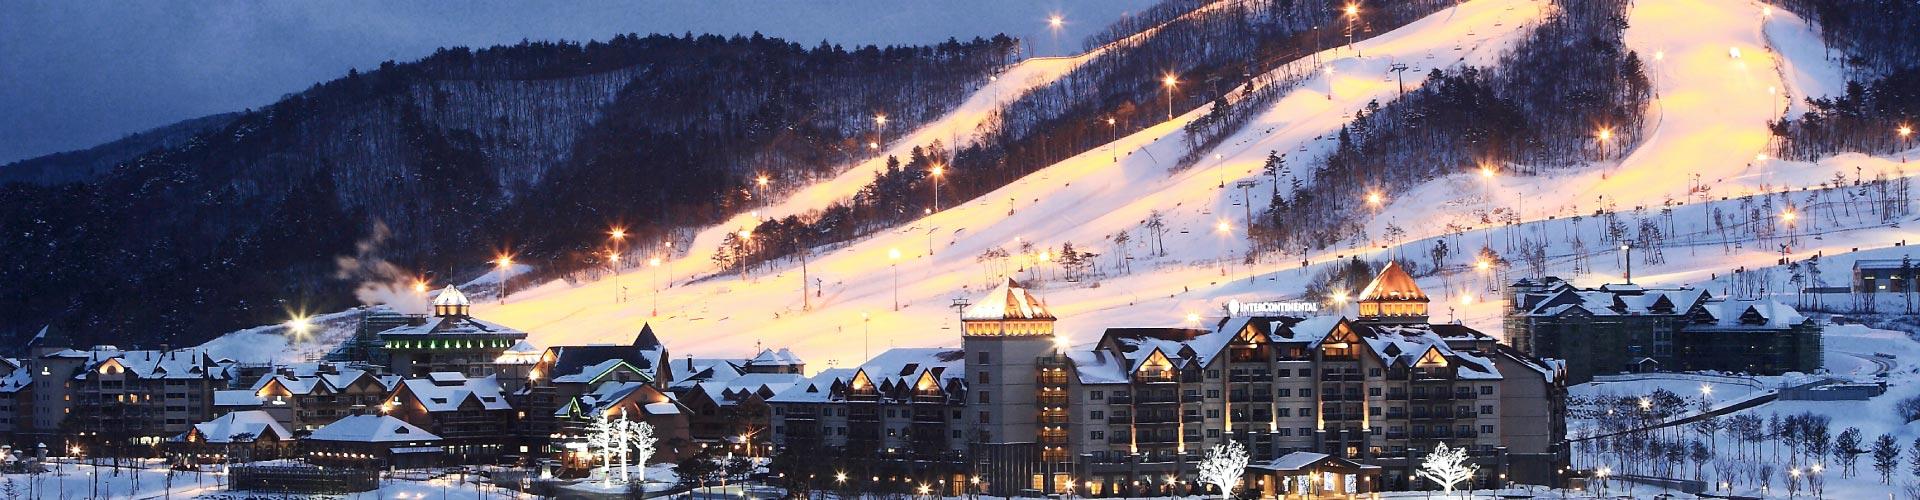 Dazzling Winter Fun In Korea + Ski Resort